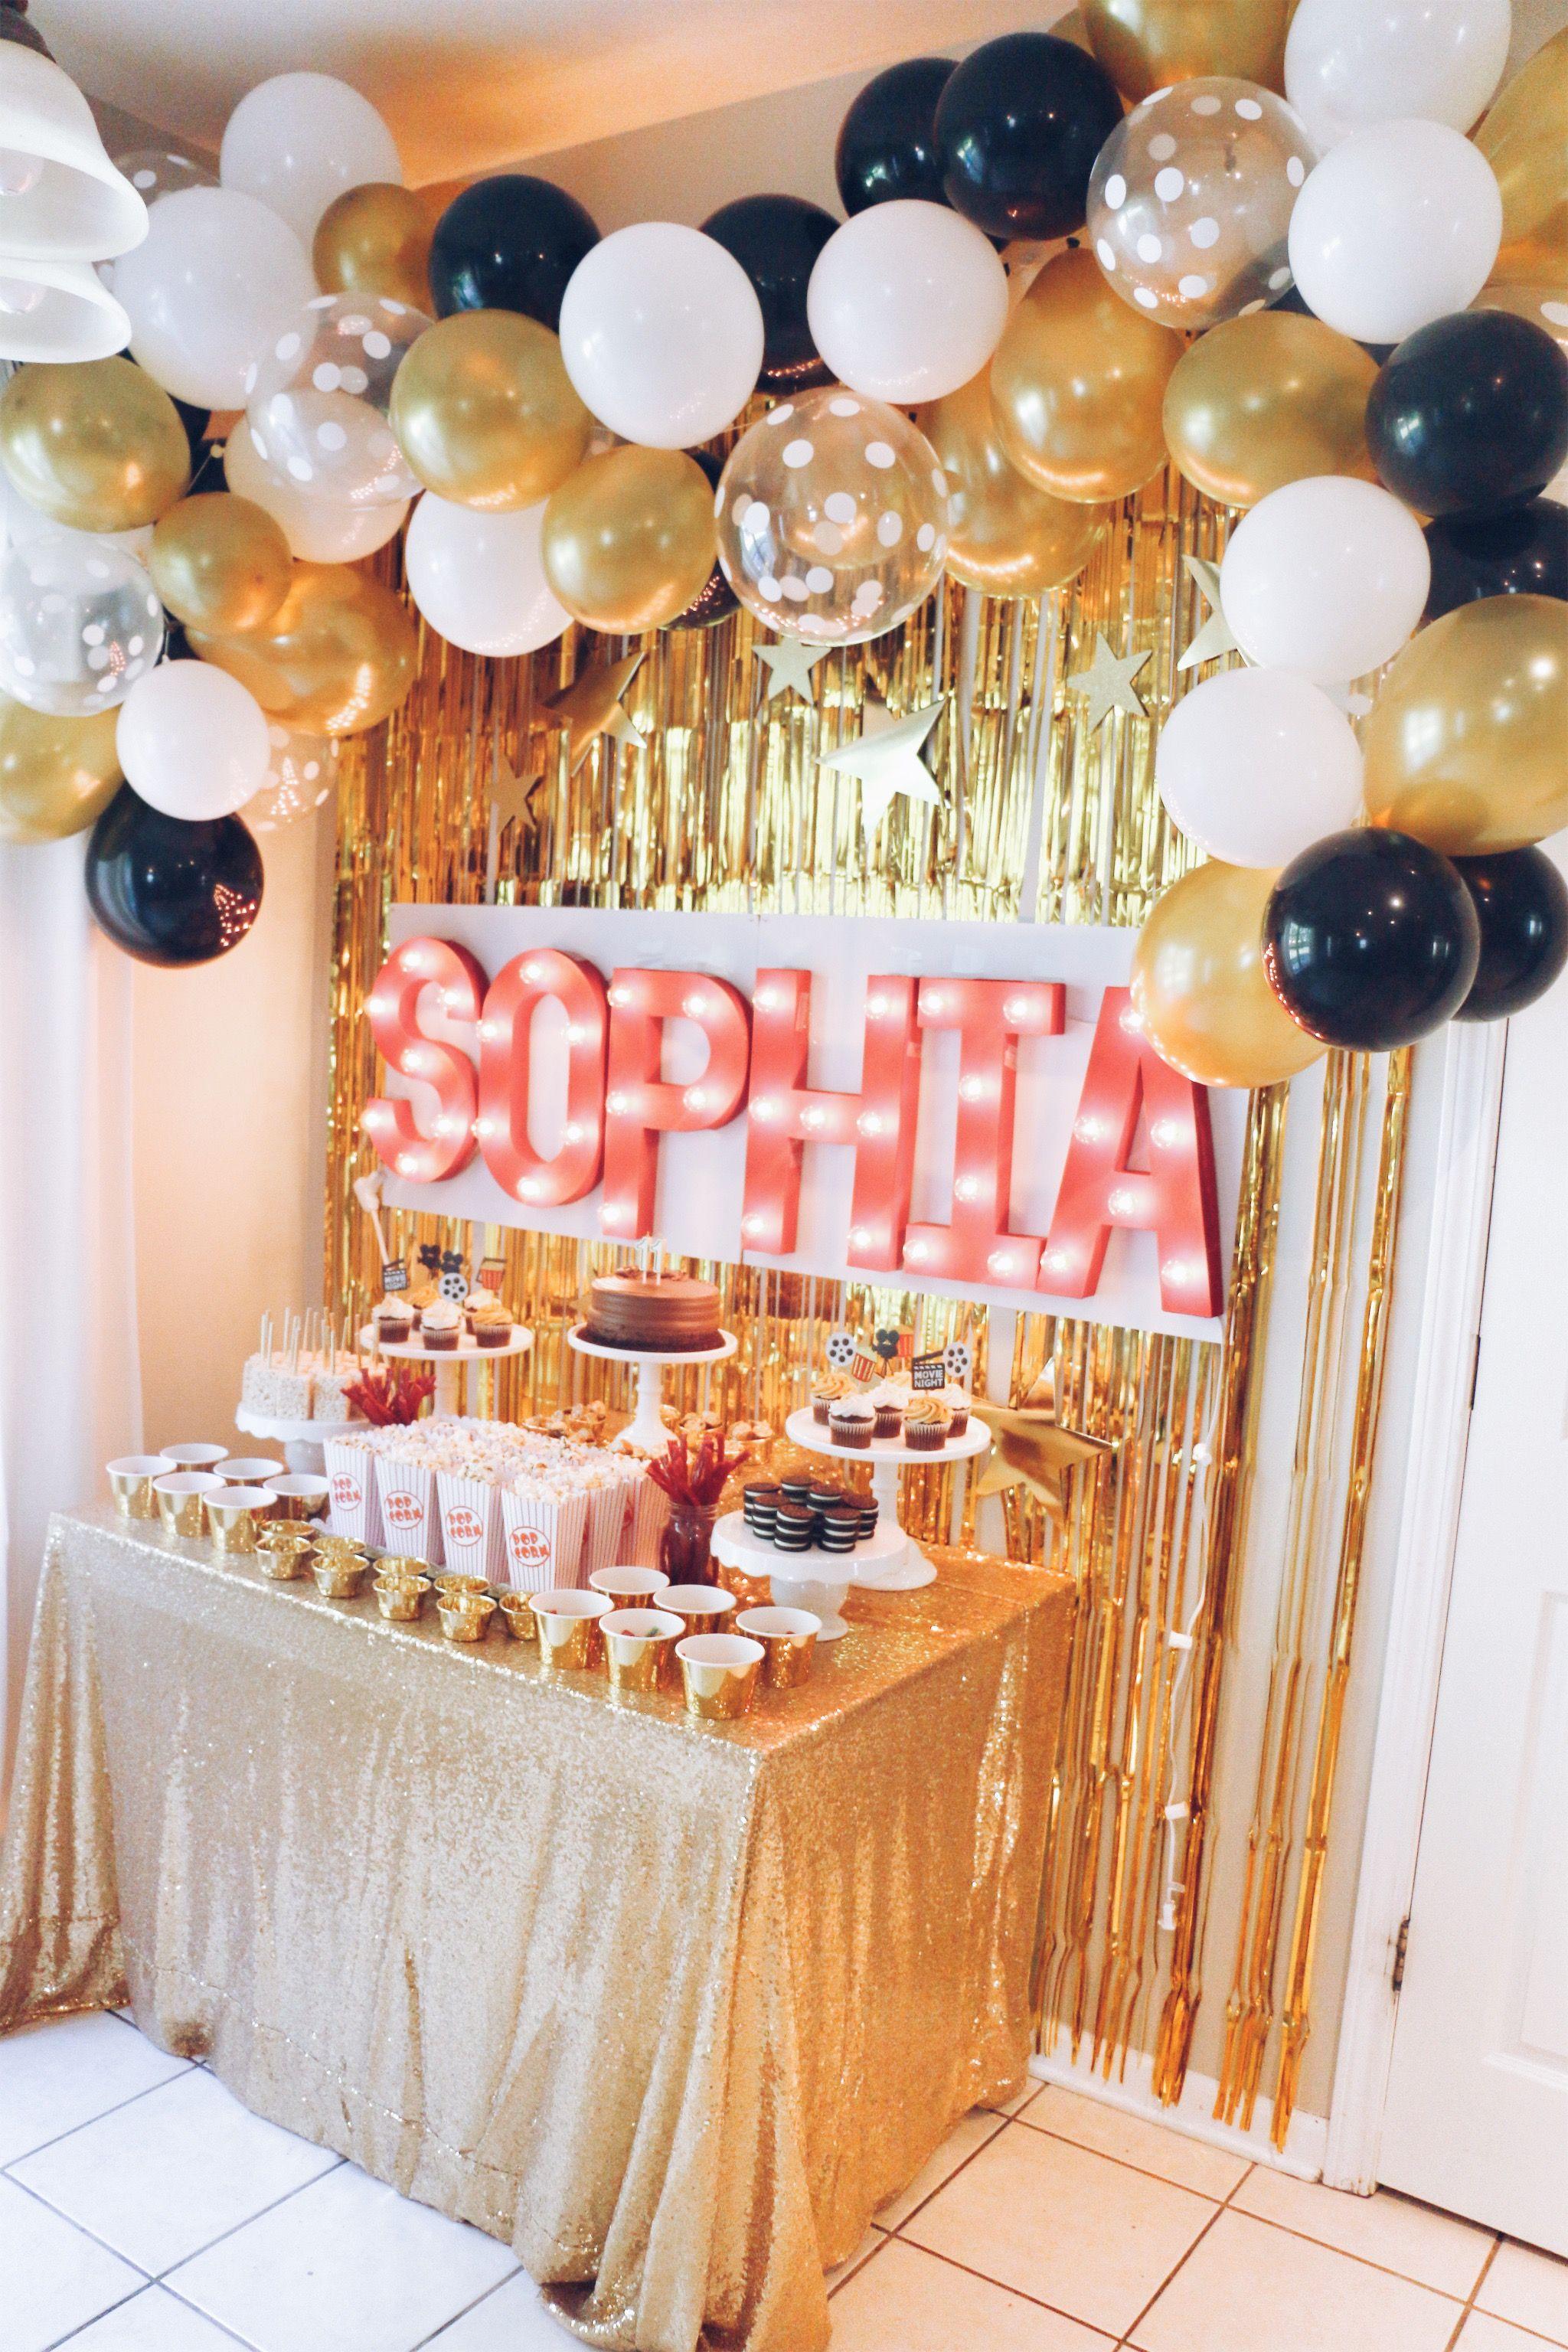 Sophia S 11th Birthday Party Hollywood Movie Theme 18th Birthday Party Themes Hollywood Birthday Party Decorations 18th Birthday Party